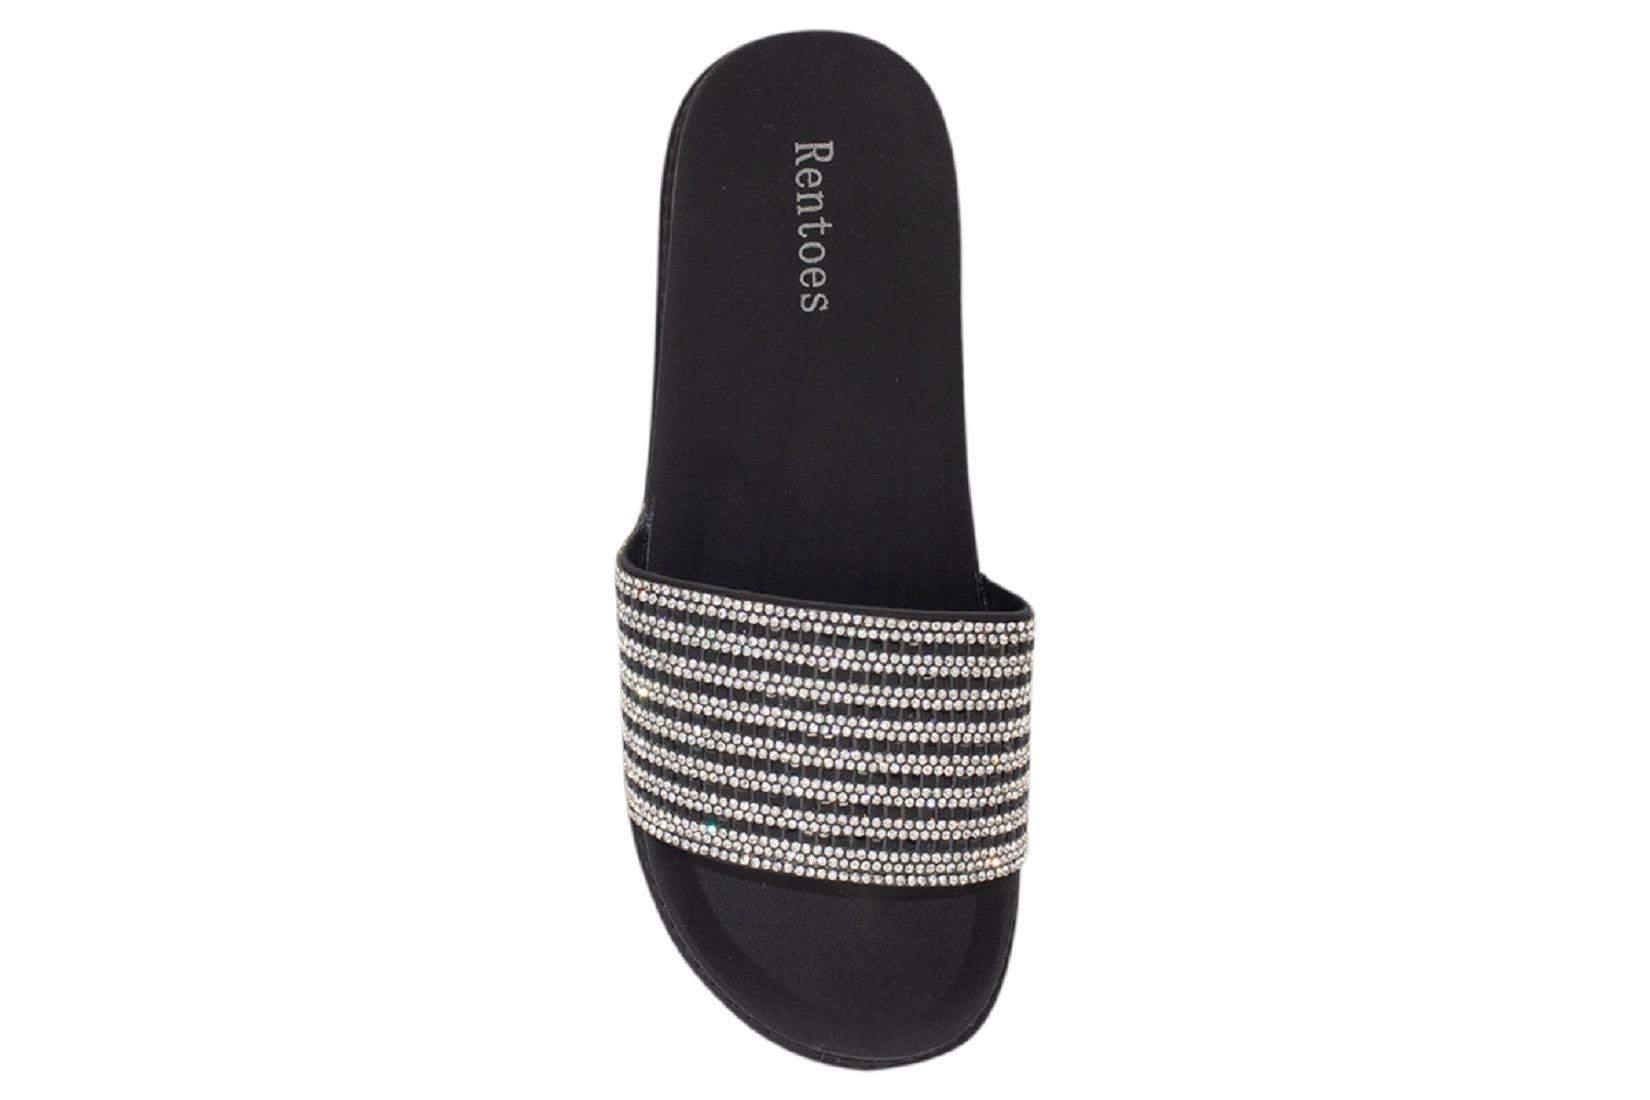 Womens-Sliders-Casual-Slippers-Mules-Ladies-Diamante-Flip-Flop-Sandals-Shoes thumbnail 90